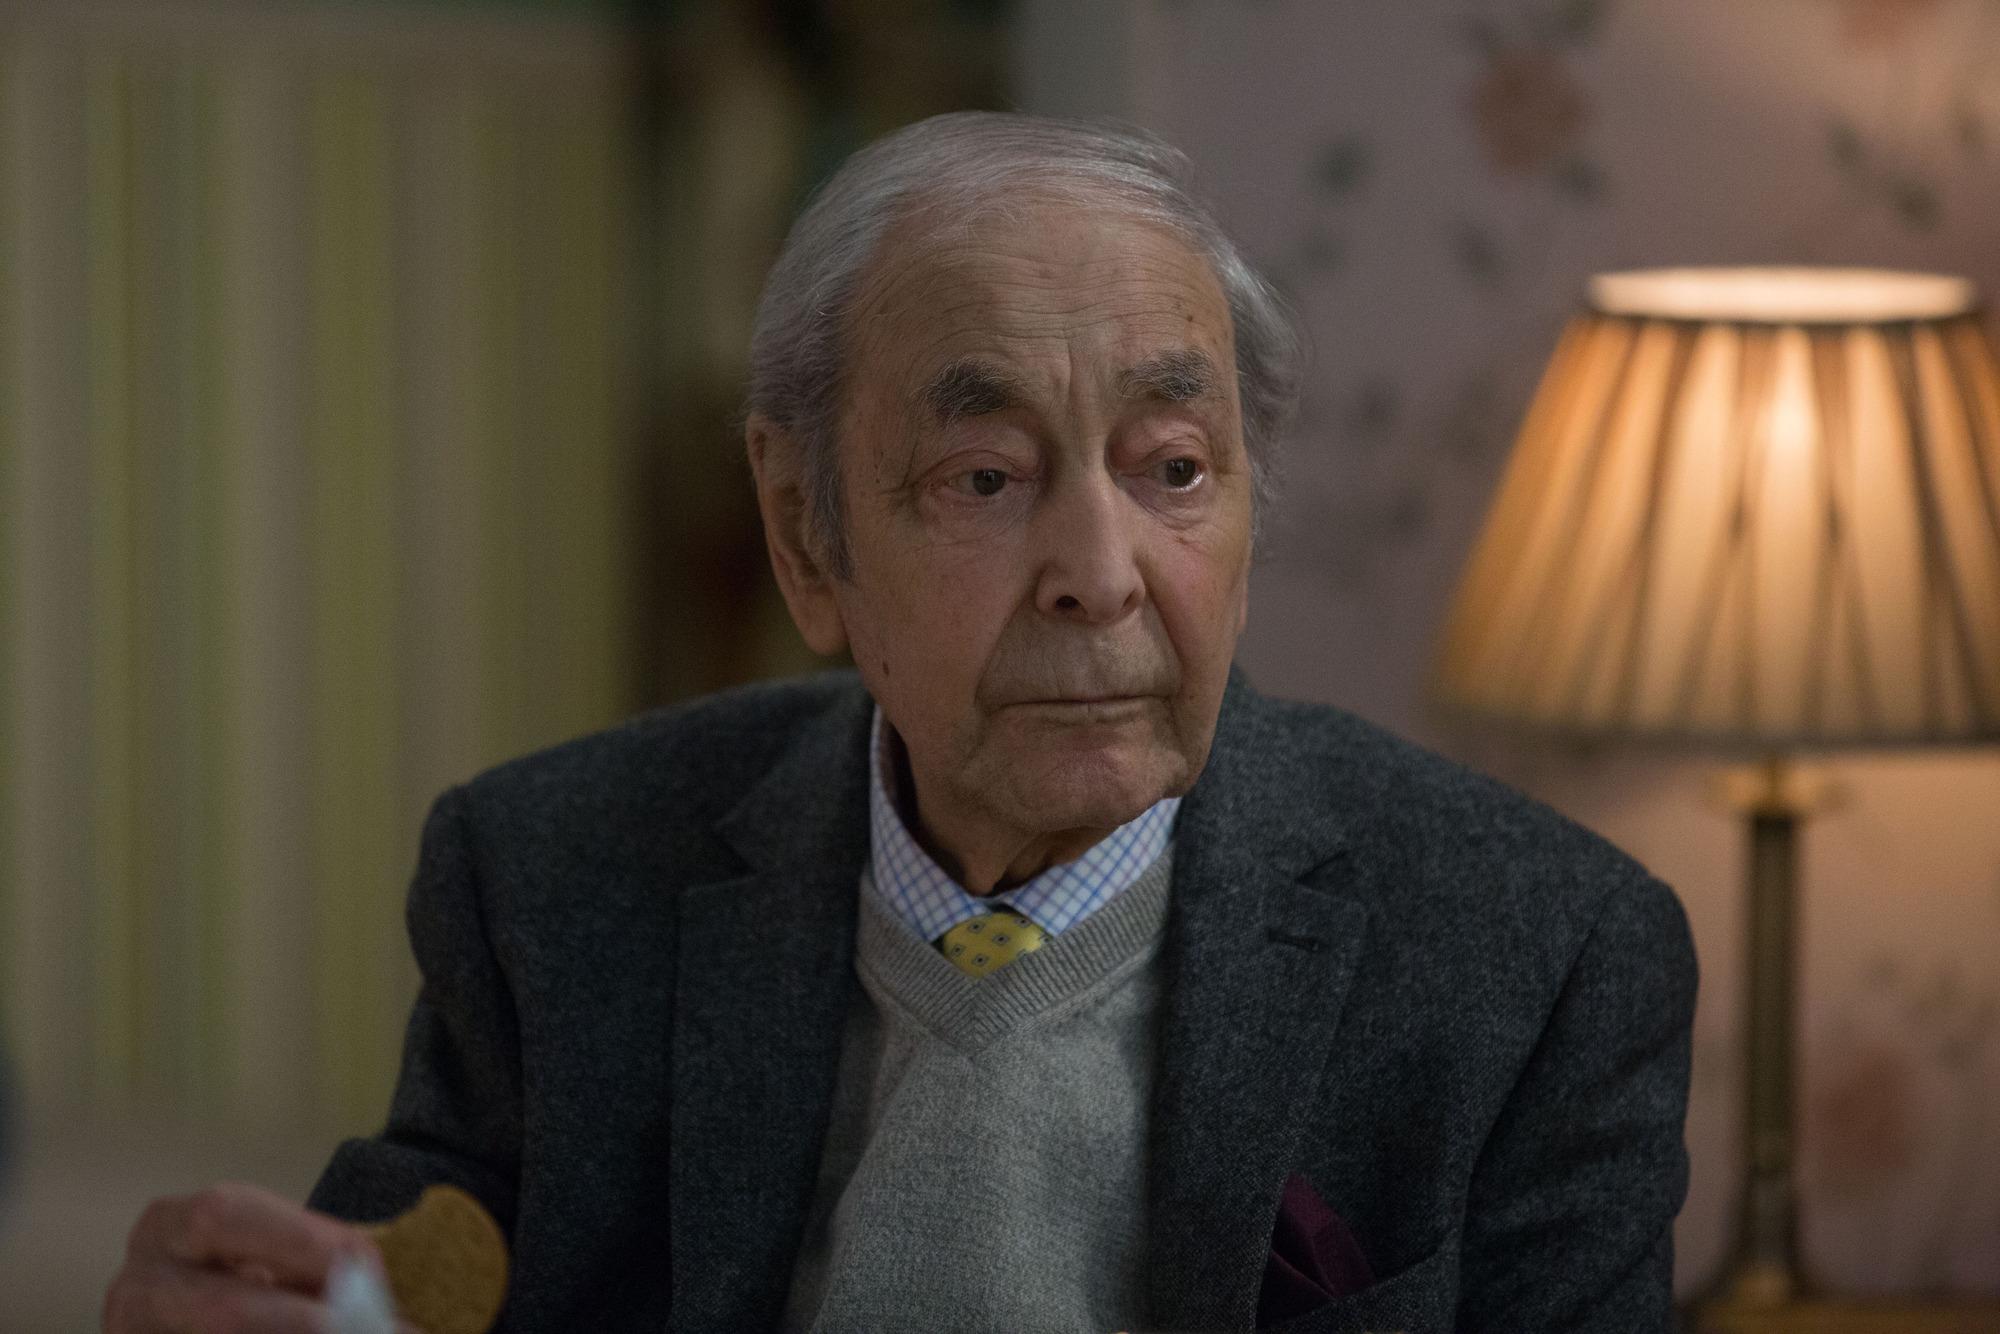 EastEnders spoilers: Dr Legg makes a heartbreaking decision ahead of sad death scenes